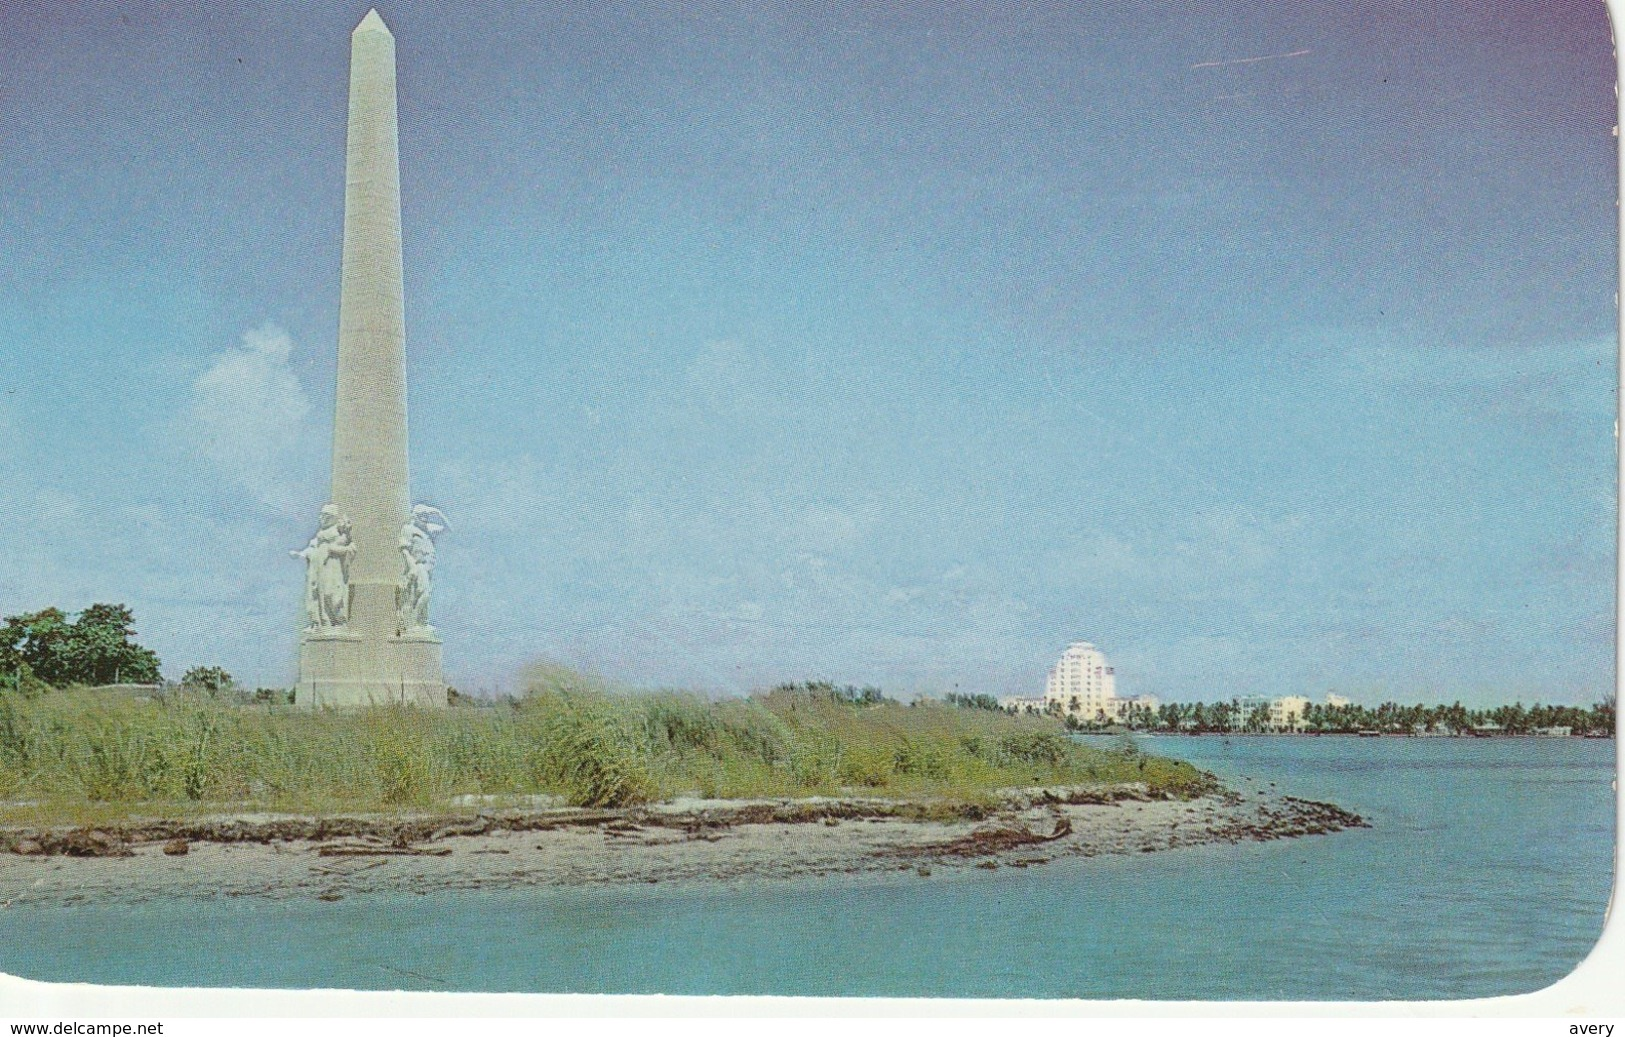 Flagler Memorial Monument In Biscayne Bay, Miami Beach, Florida - Miami Beach